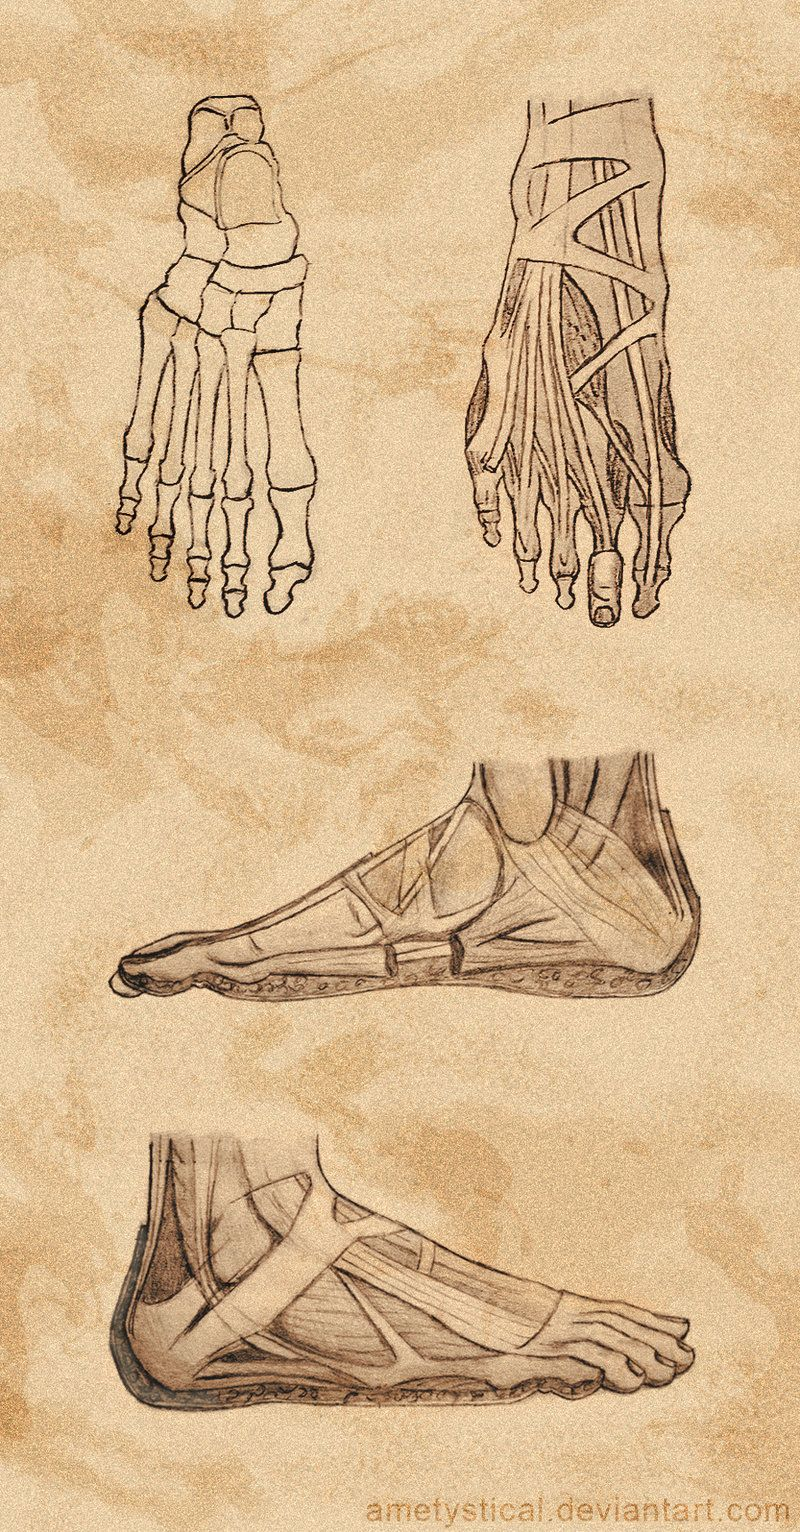 Right) Foot Study by Ametystical.deviantart.com on @DeviantArt ...